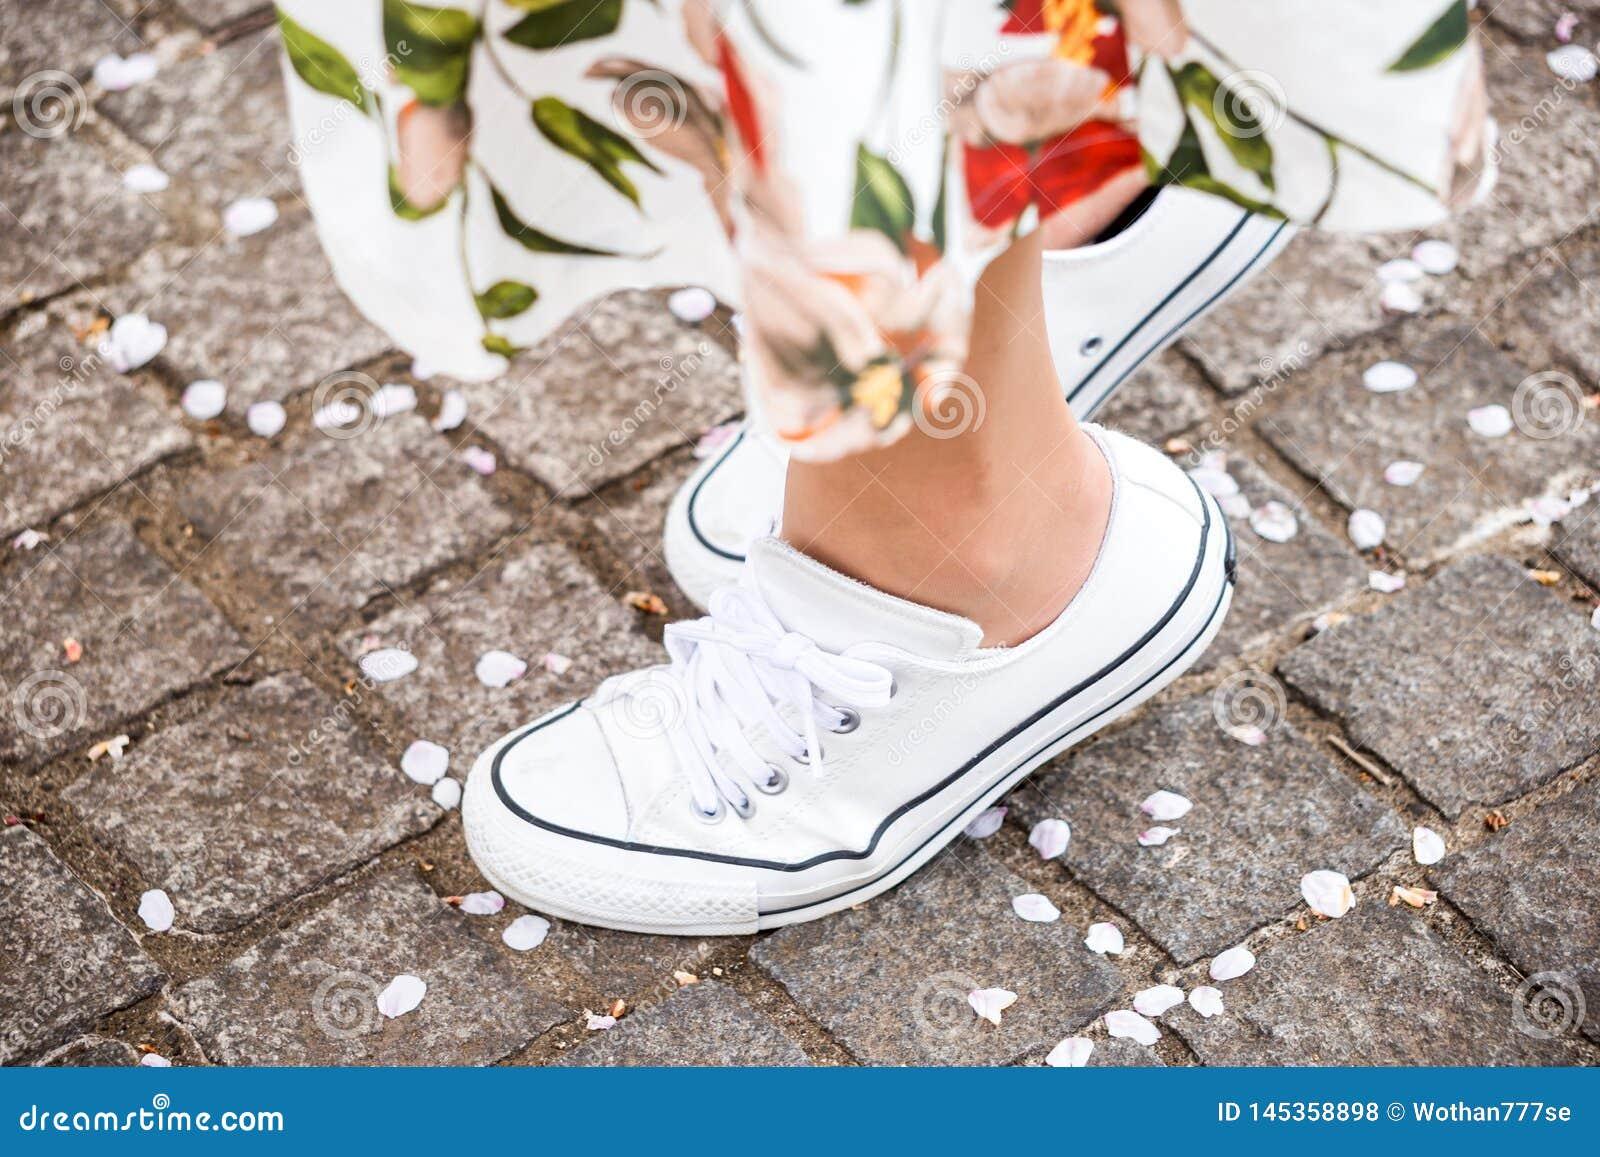 Woman standing on tiptoes